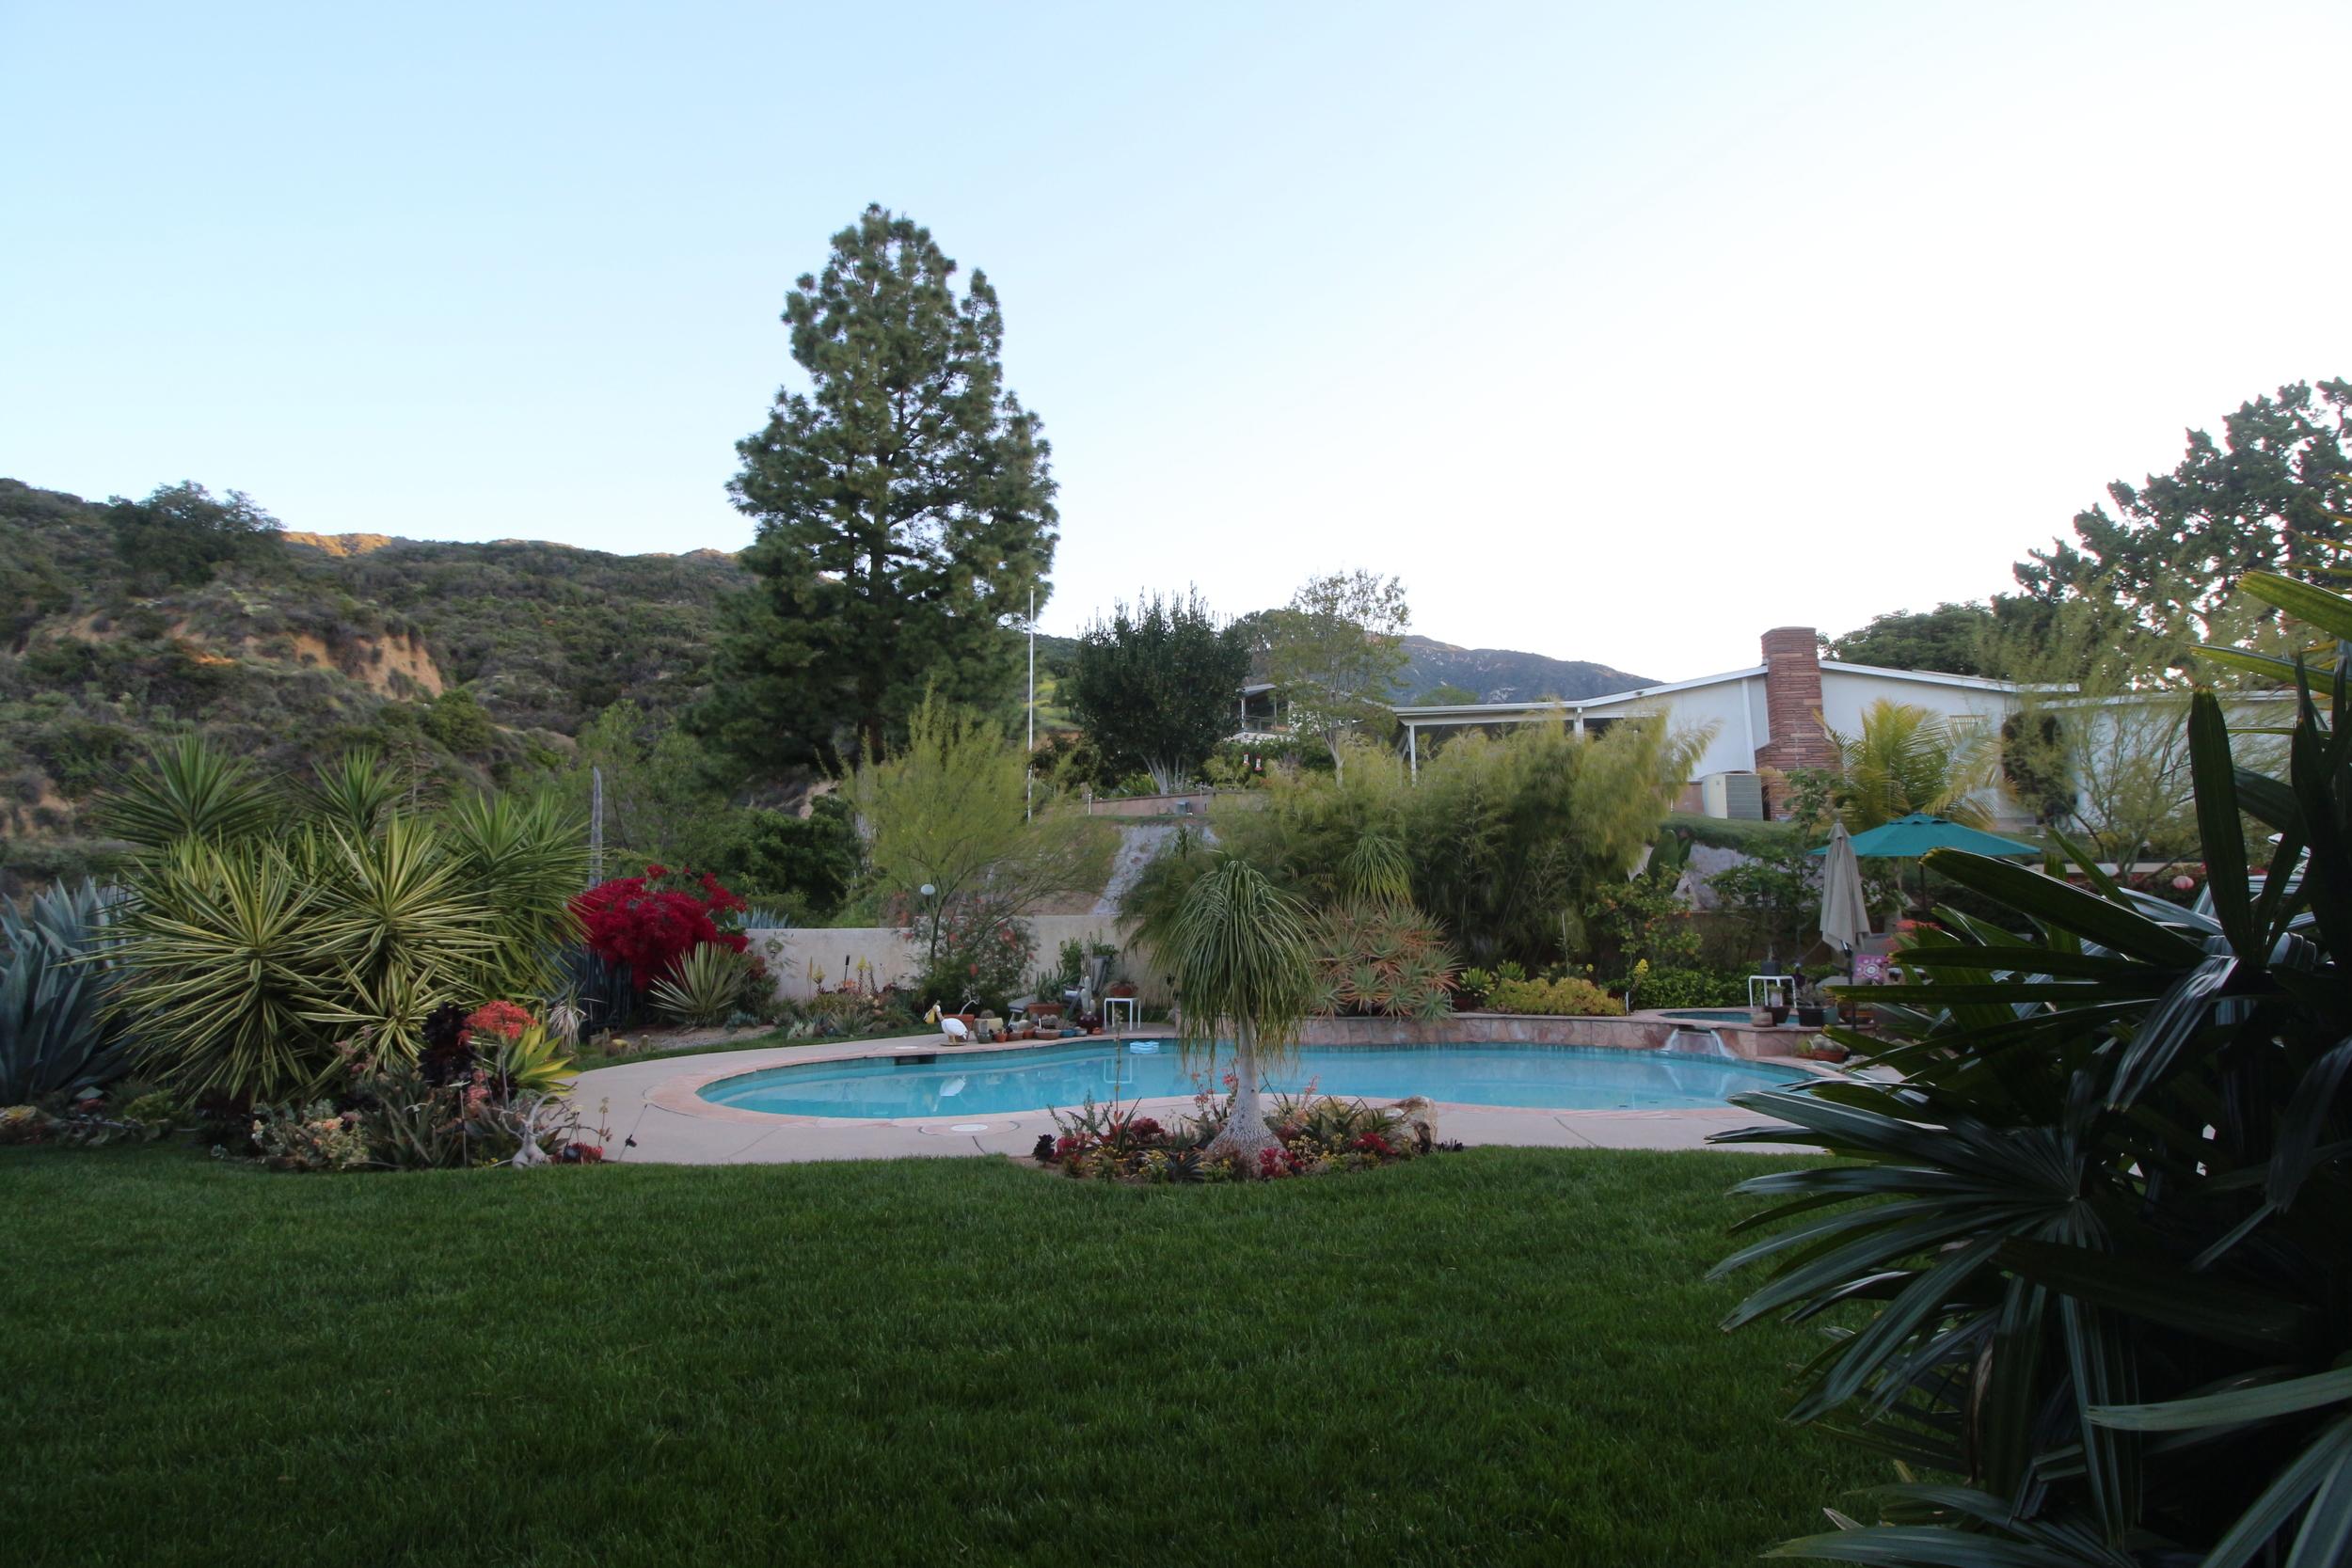 airbnb mountain in the backyard monrovia california. Black Bedroom Furniture Sets. Home Design Ideas